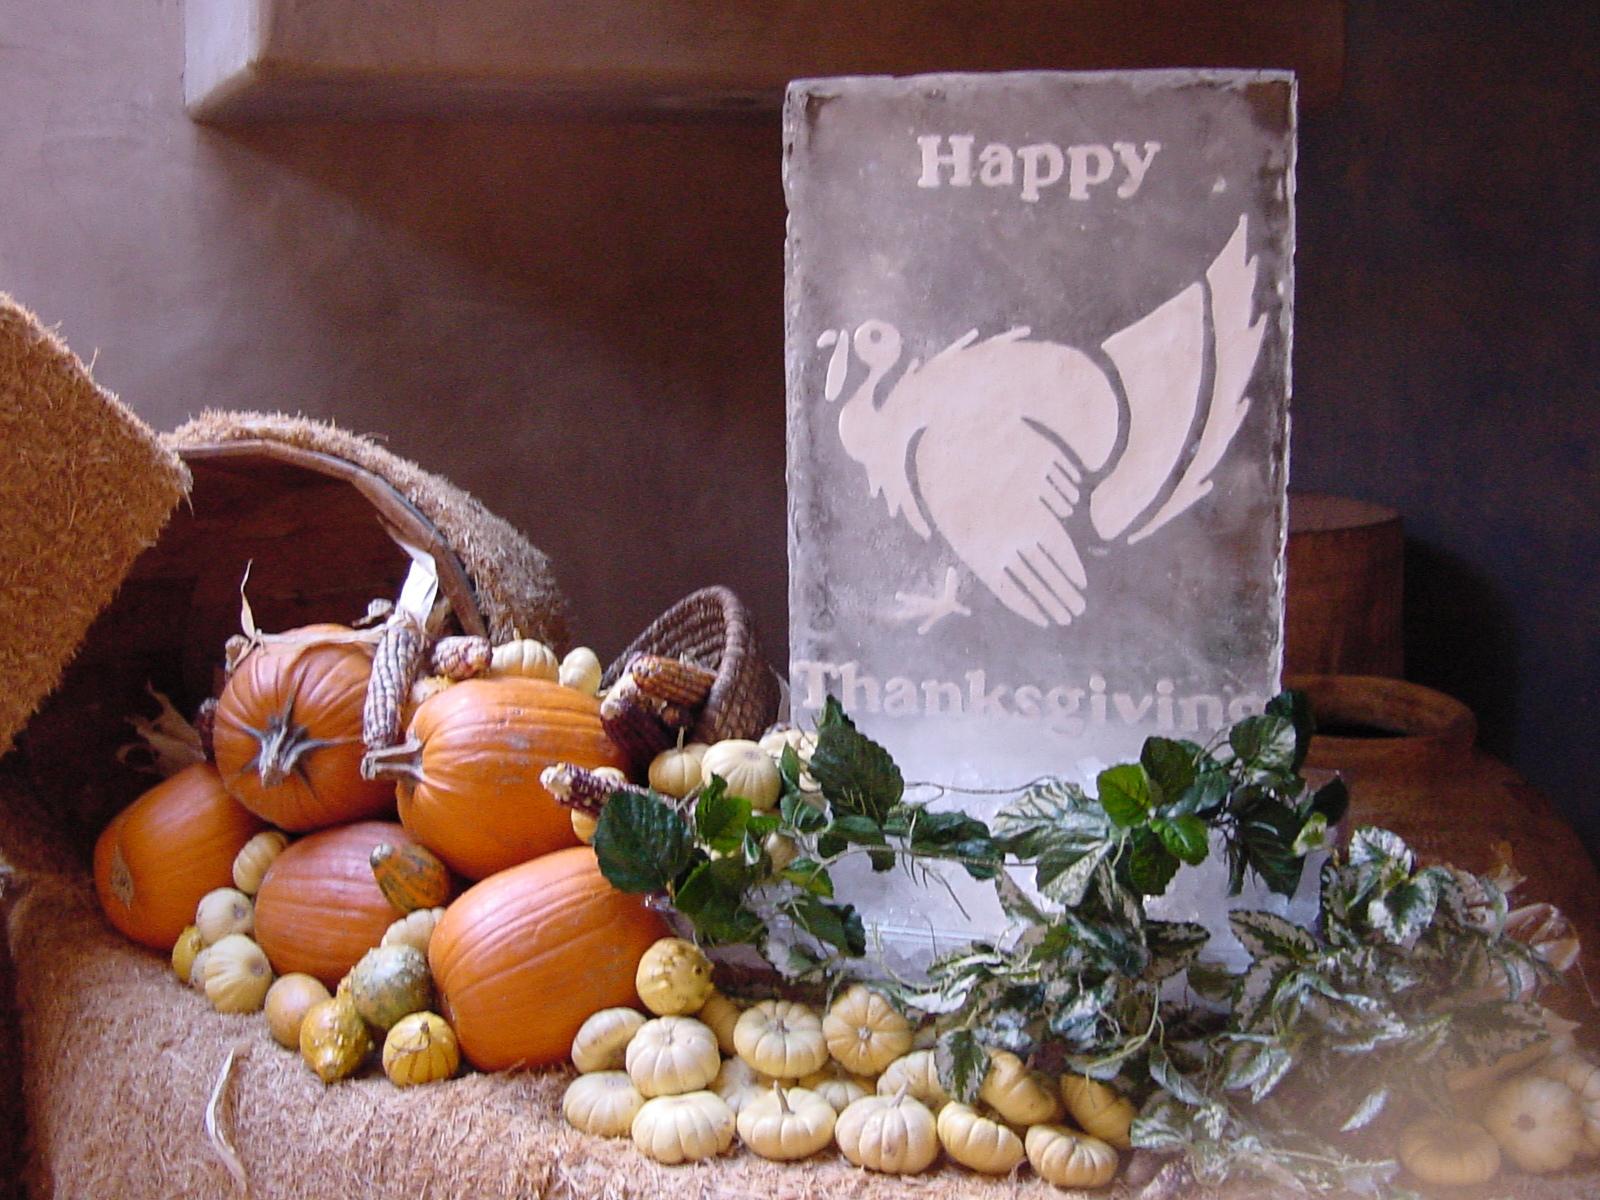 11-23-00 Thanksgiving Logo 4.jpg